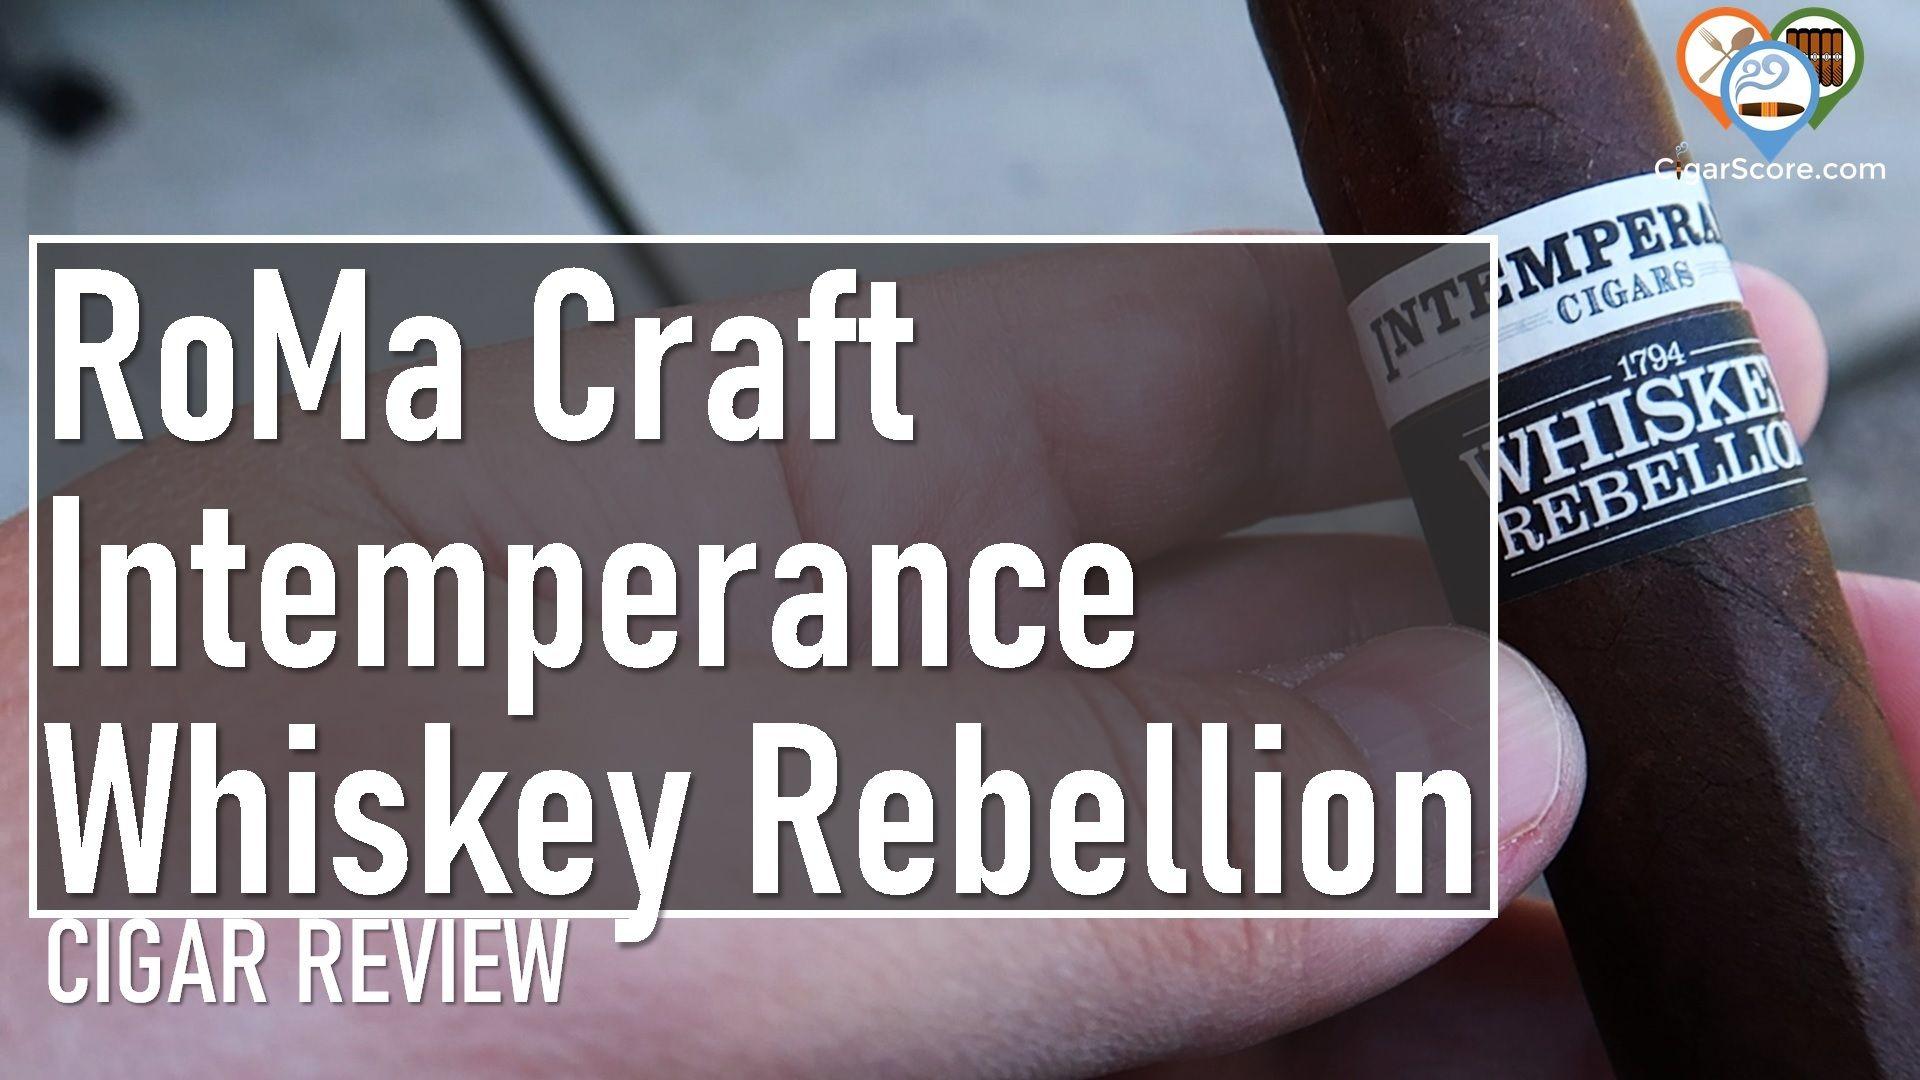 Review - RoMa Craft Intemperance Whiskey Rebellion 1794 Bradford